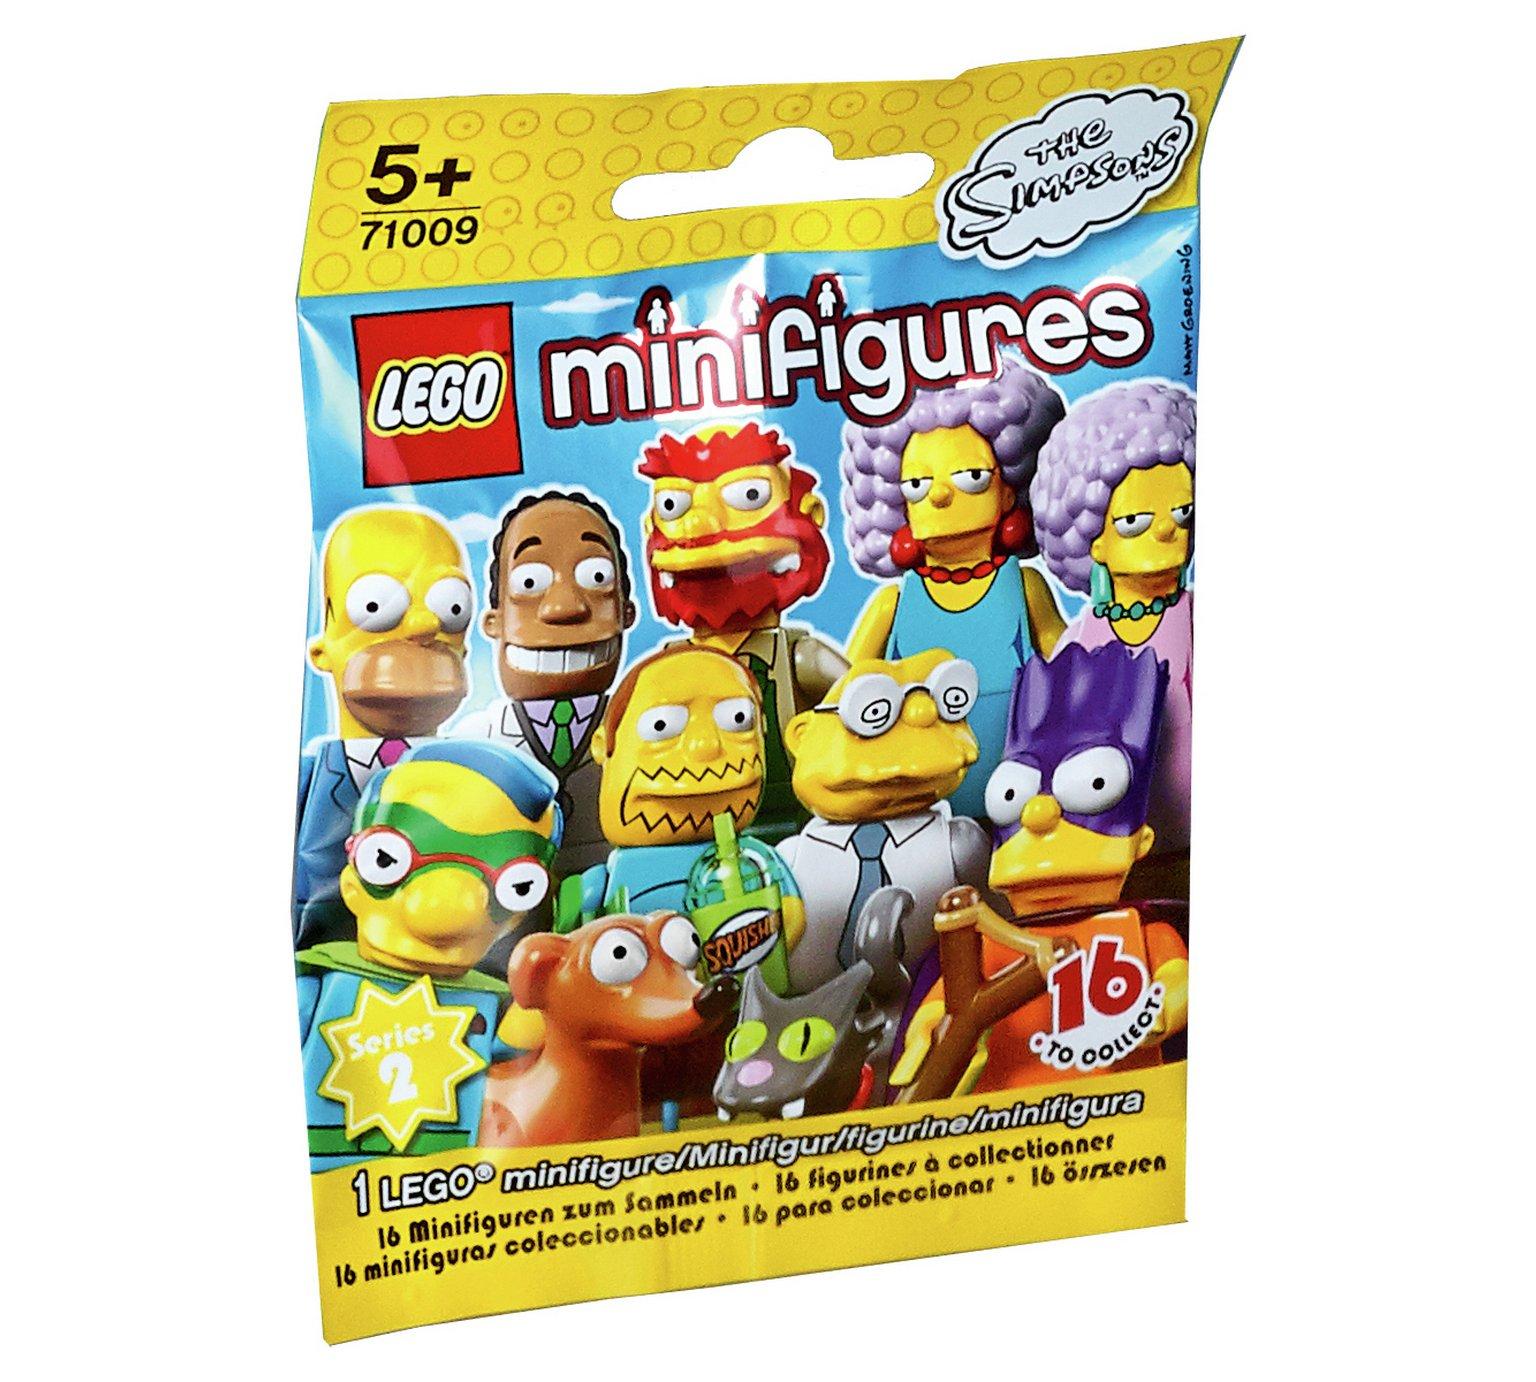 LEGO Minifigures Simpsons 2 - 71009 50p @ John Lewis PLUS get a free gift